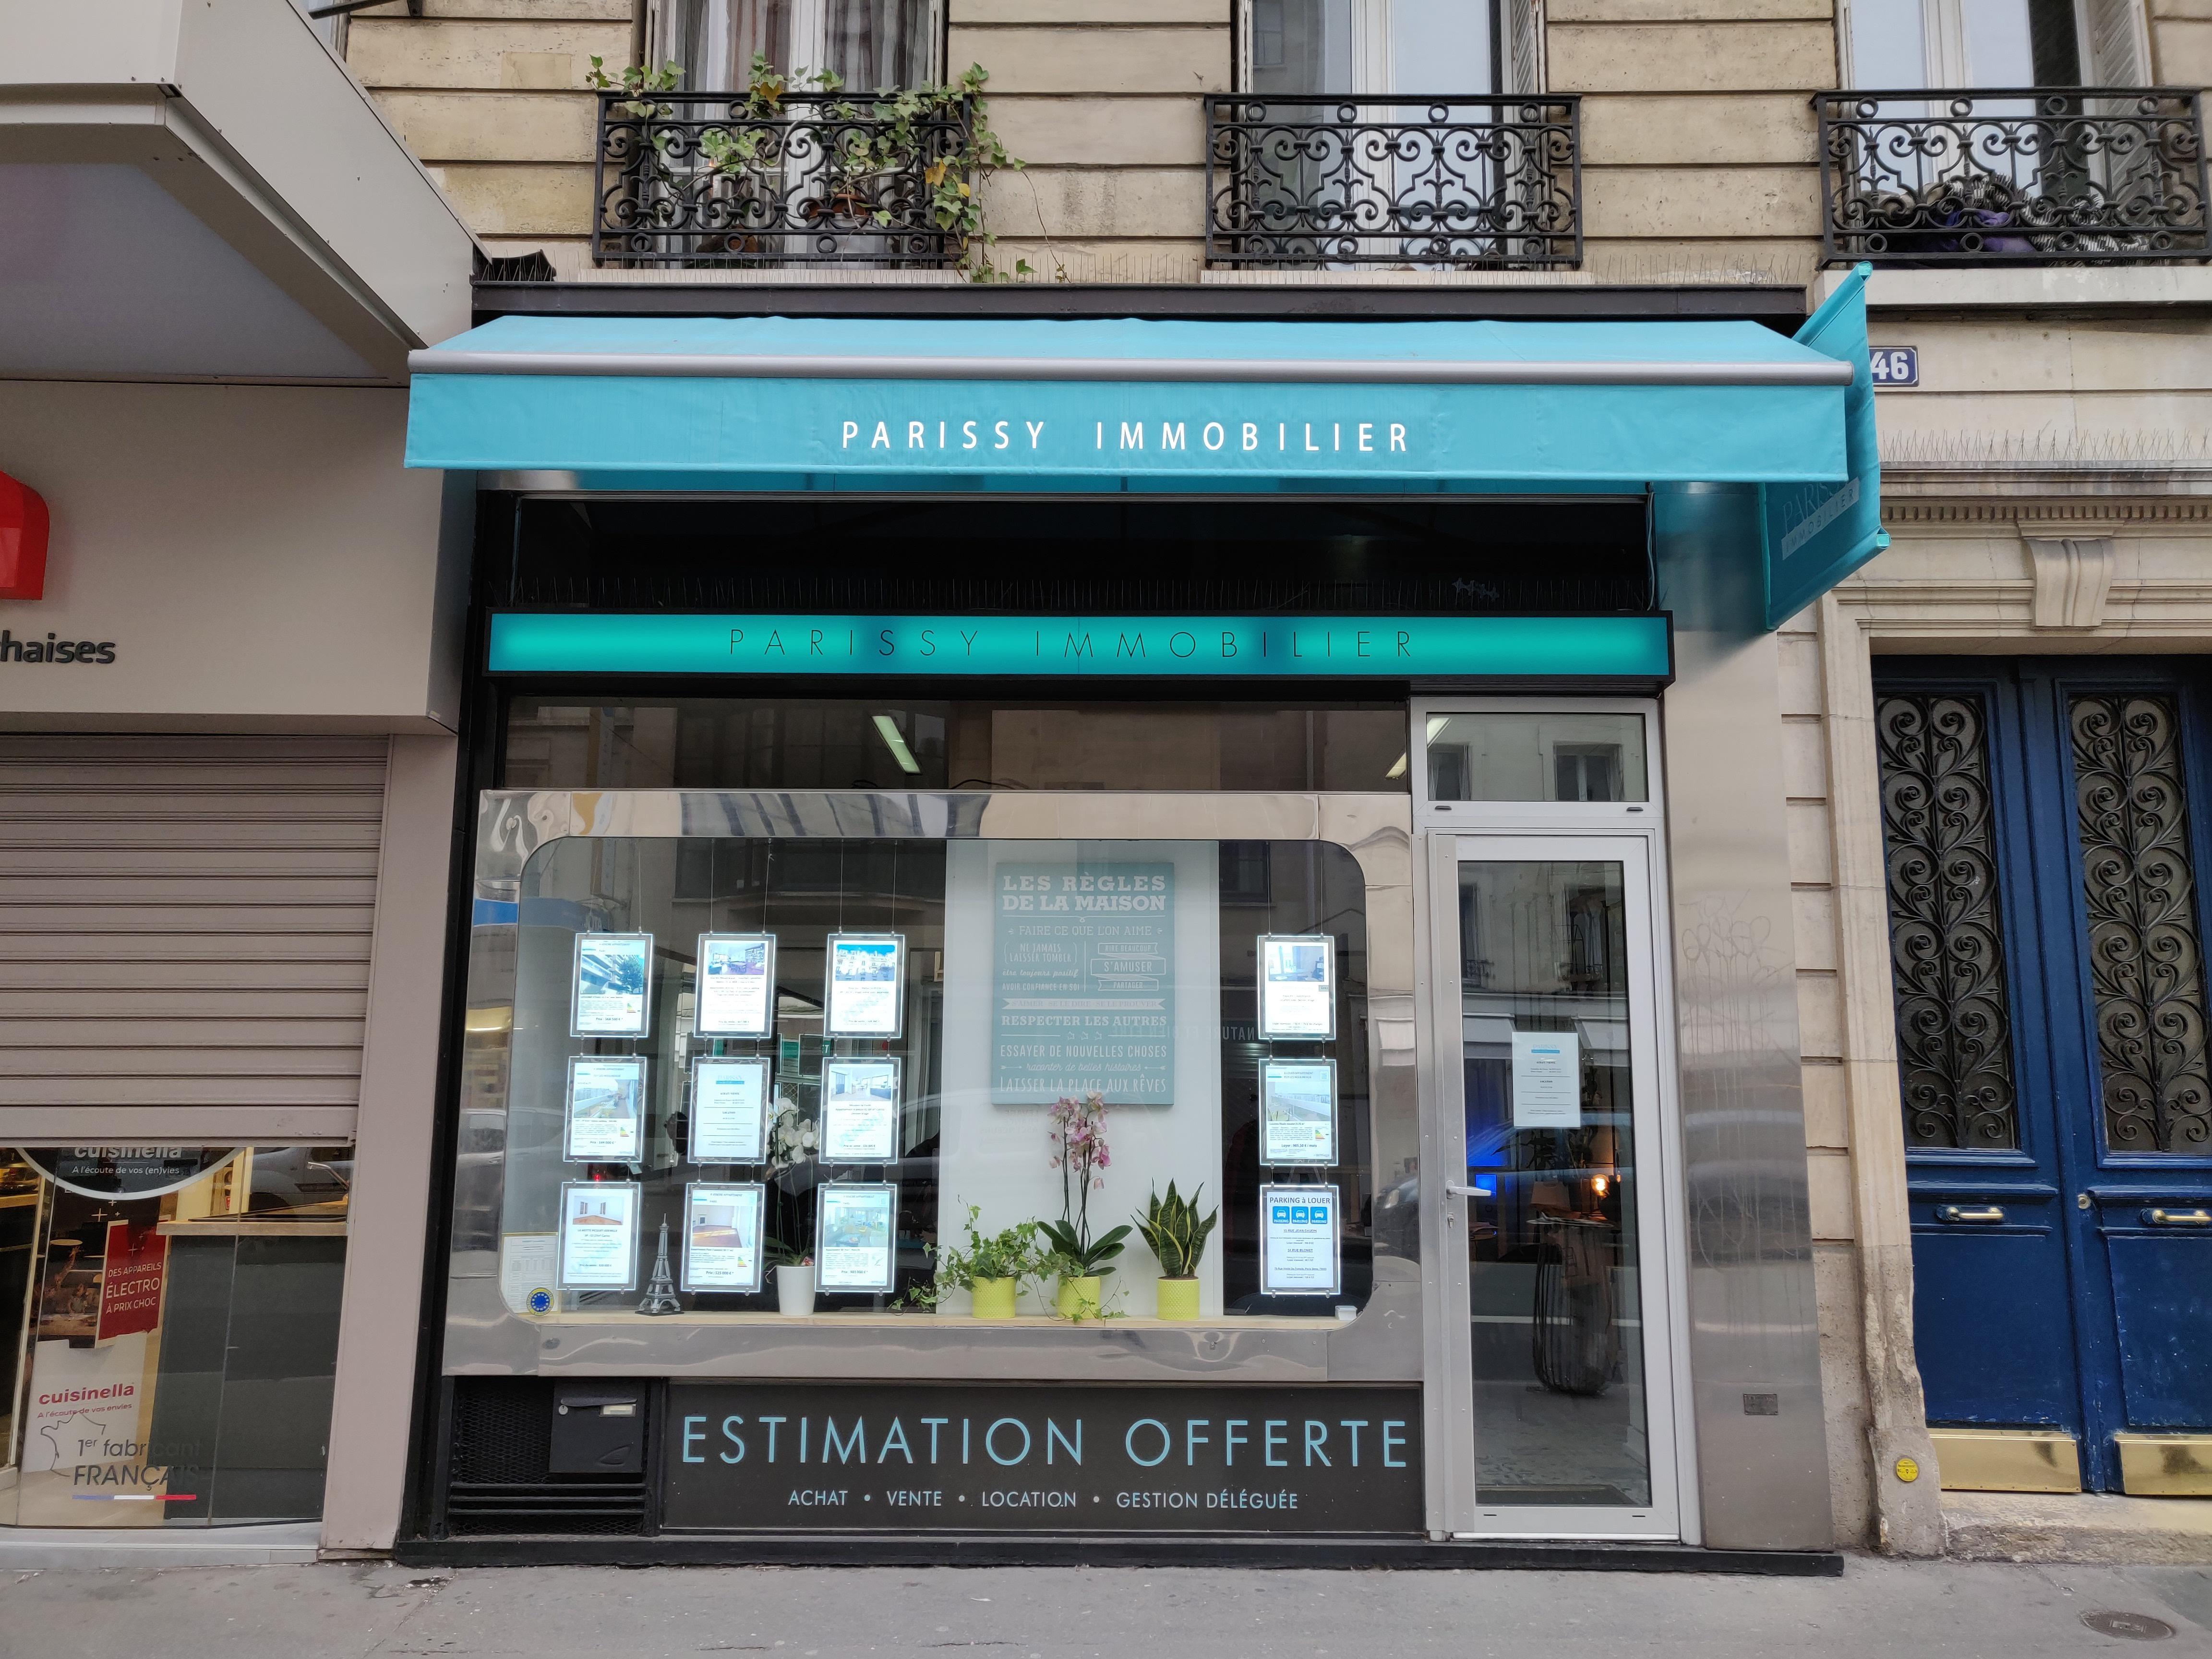 PARISSY Immobilier